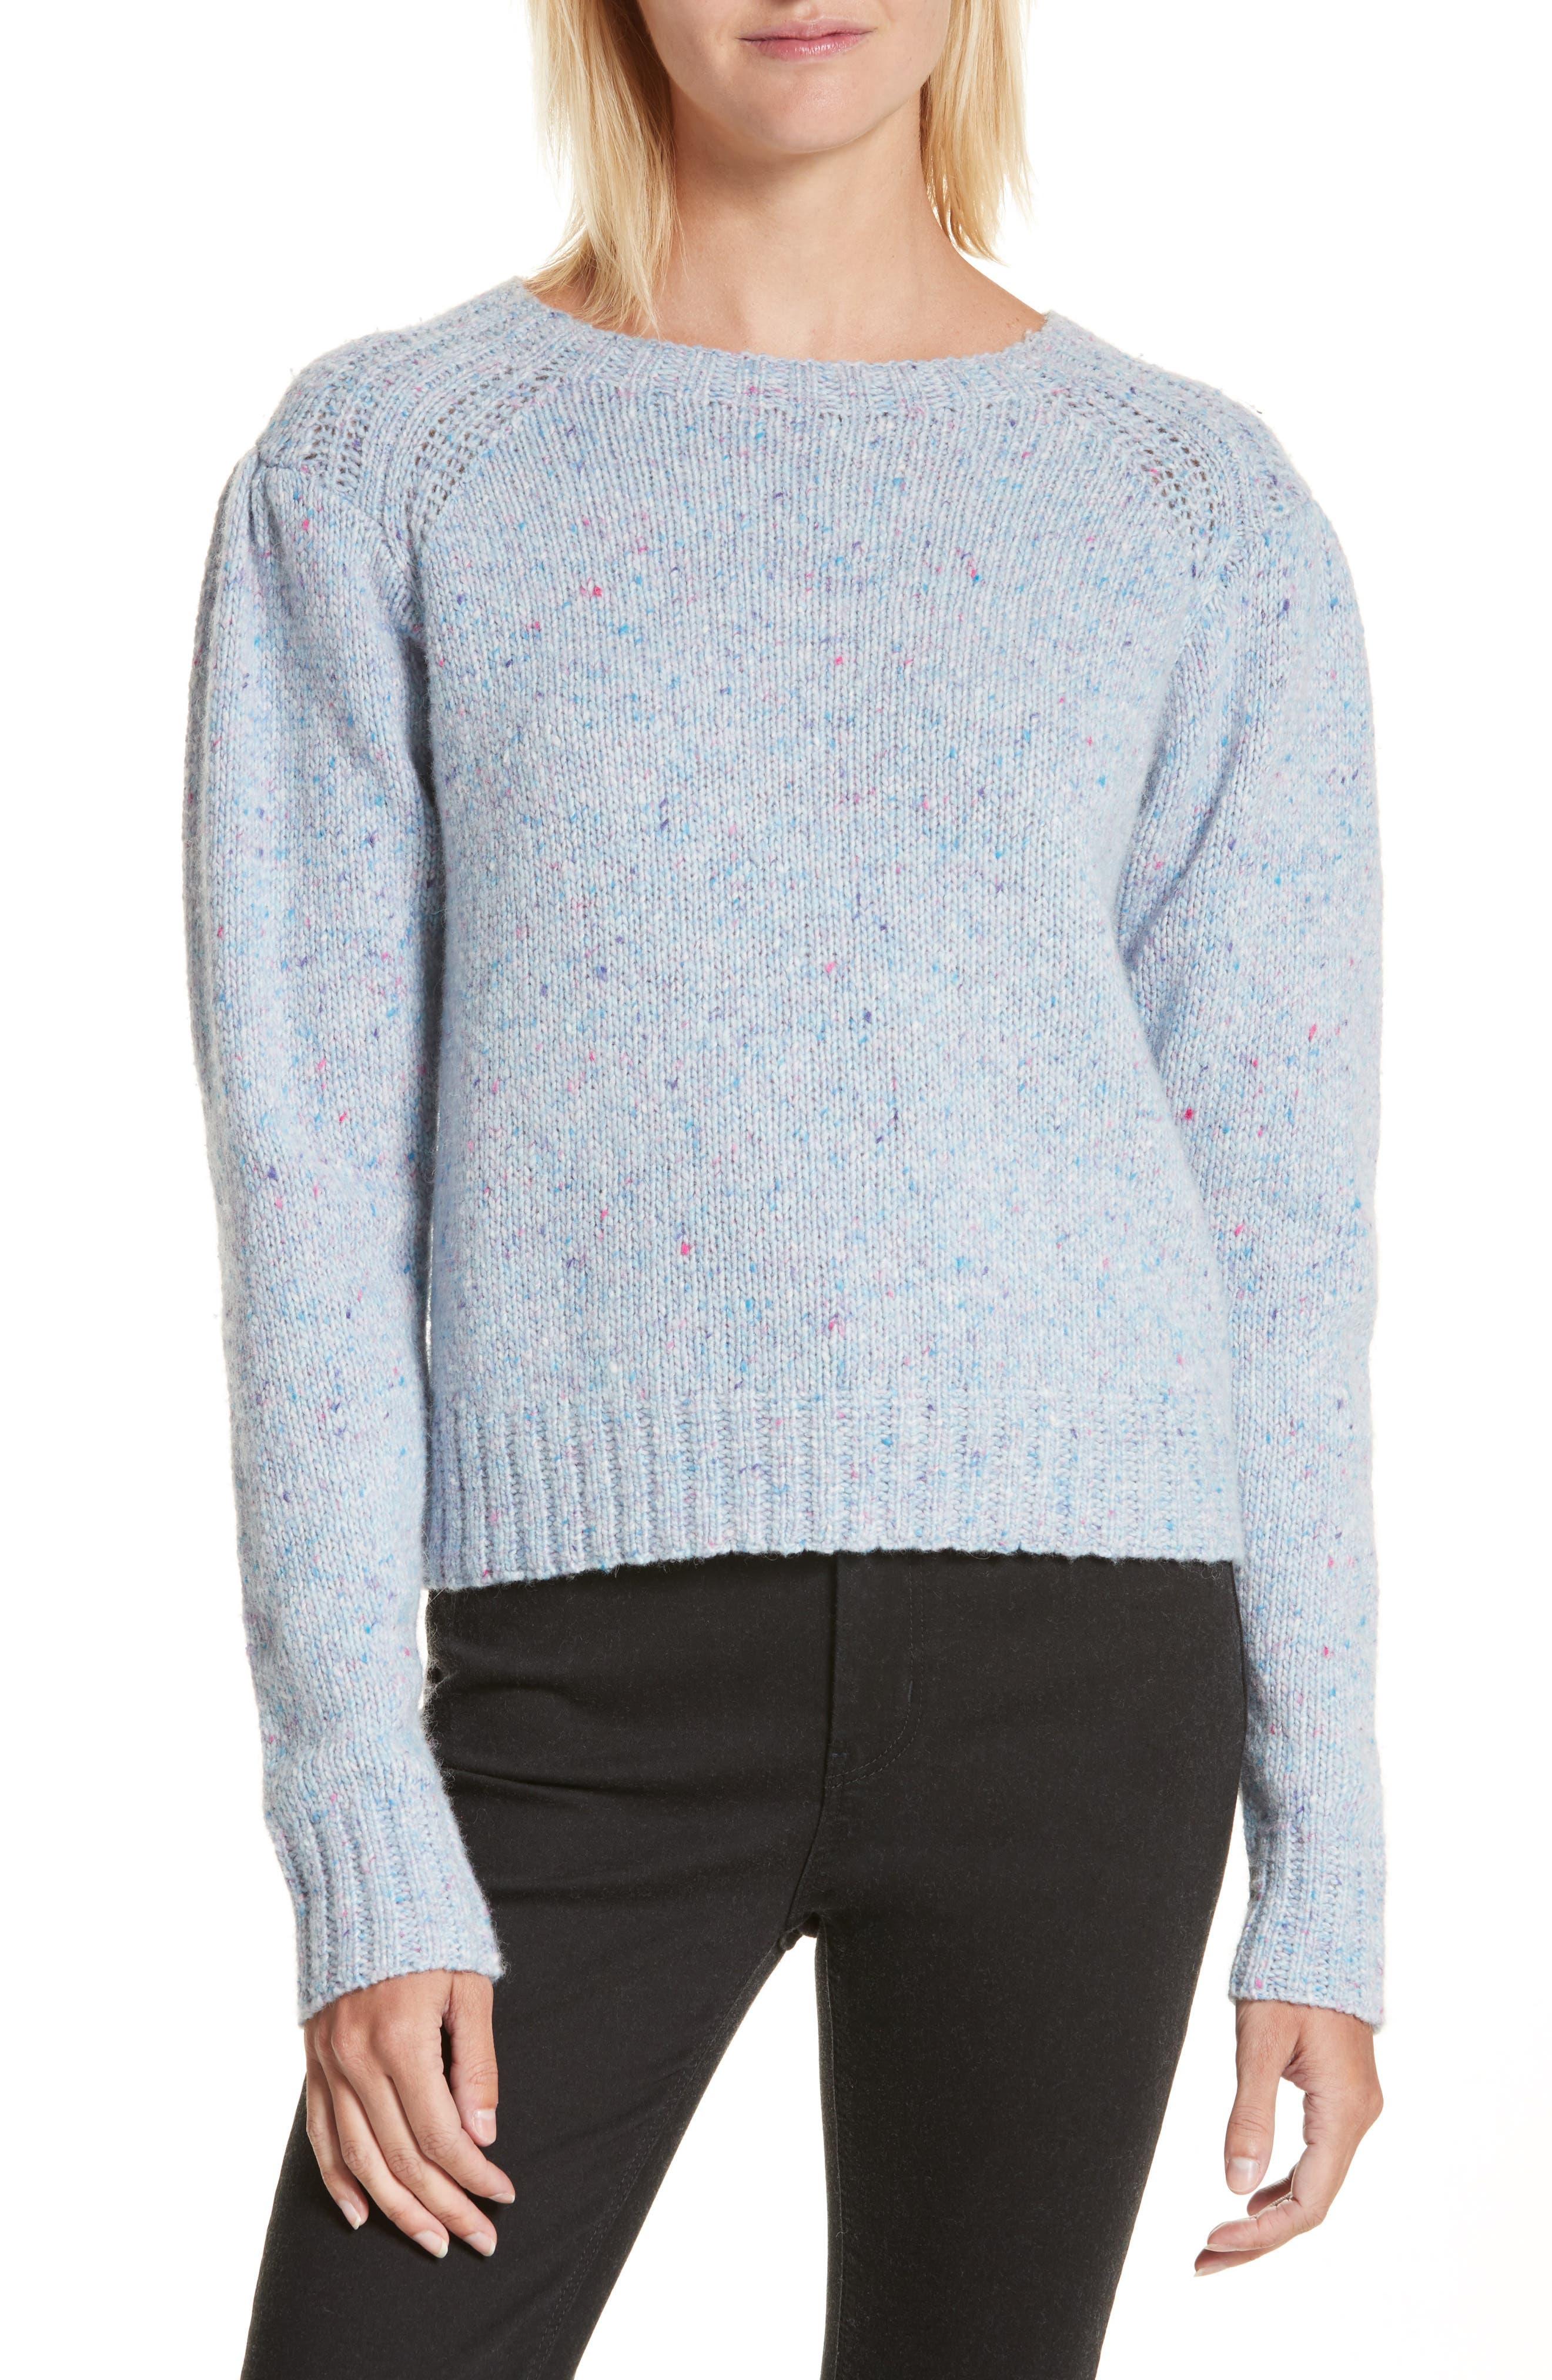 La Vie Rebecca Taylor Donegal Tweed Pullover